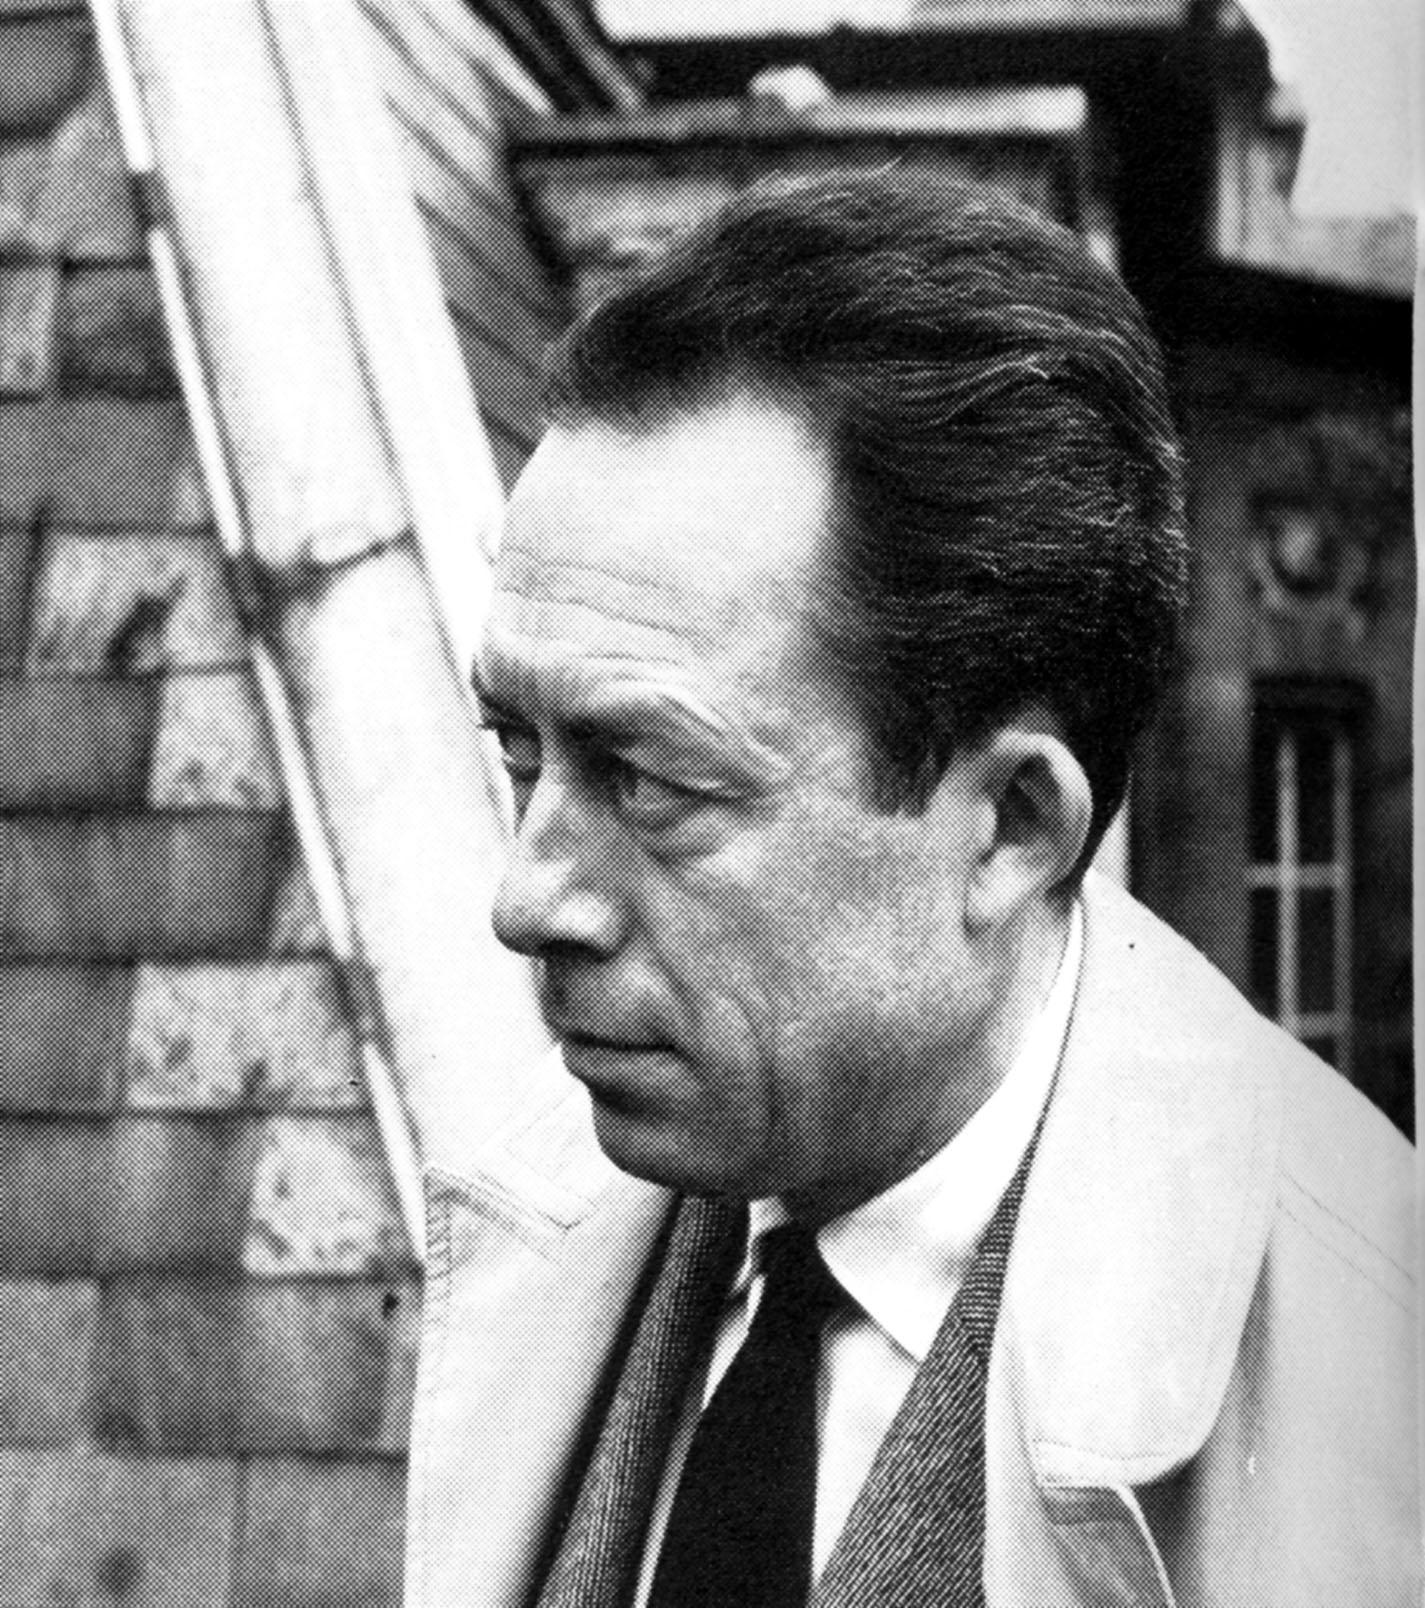 albert-camus-profil-1947.1265542772.jpg